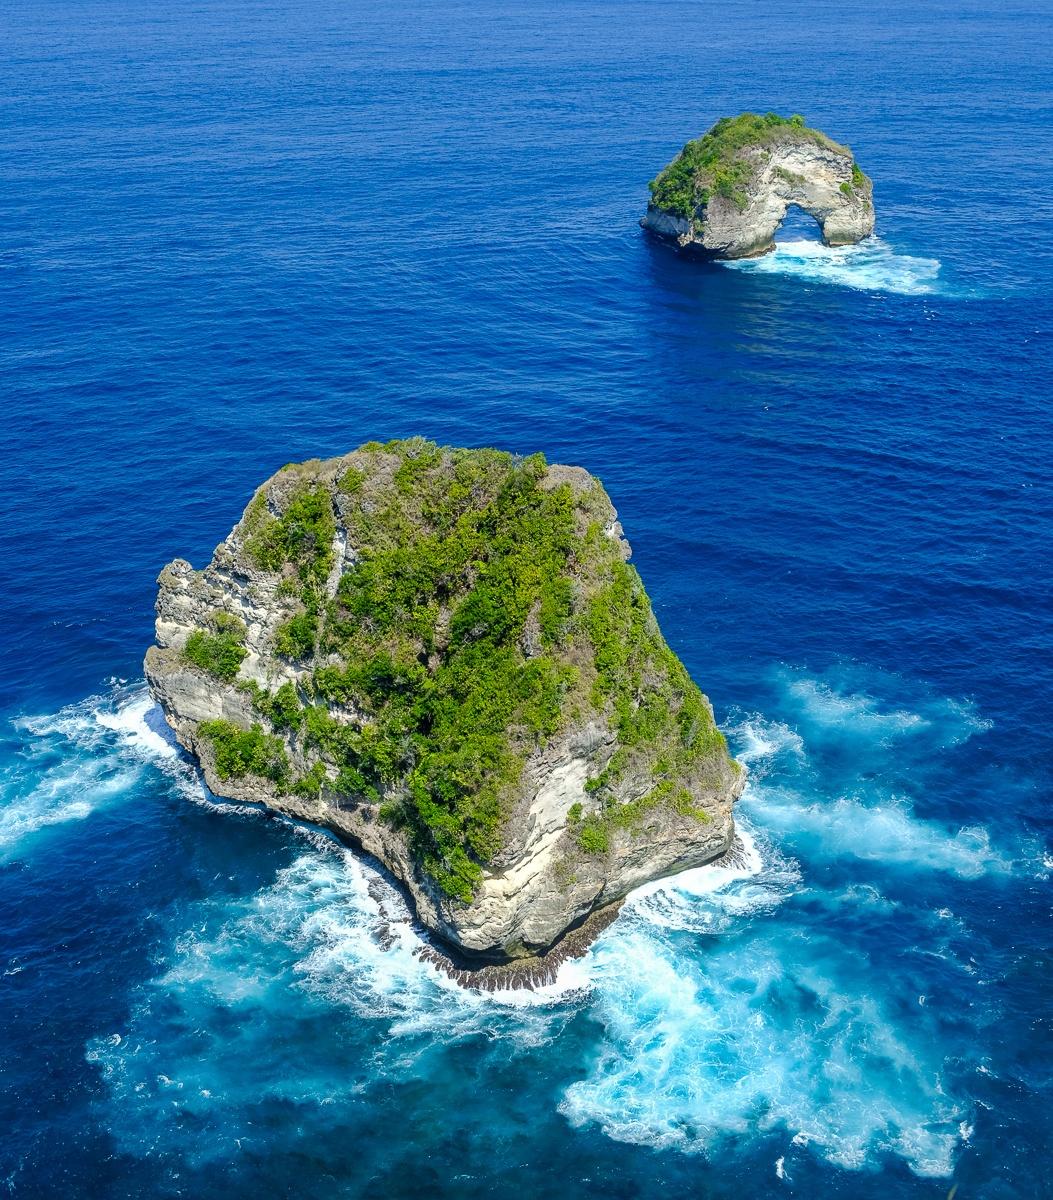 Two sea rocks at Banah Cliff Point in Nusa Penida, Bali